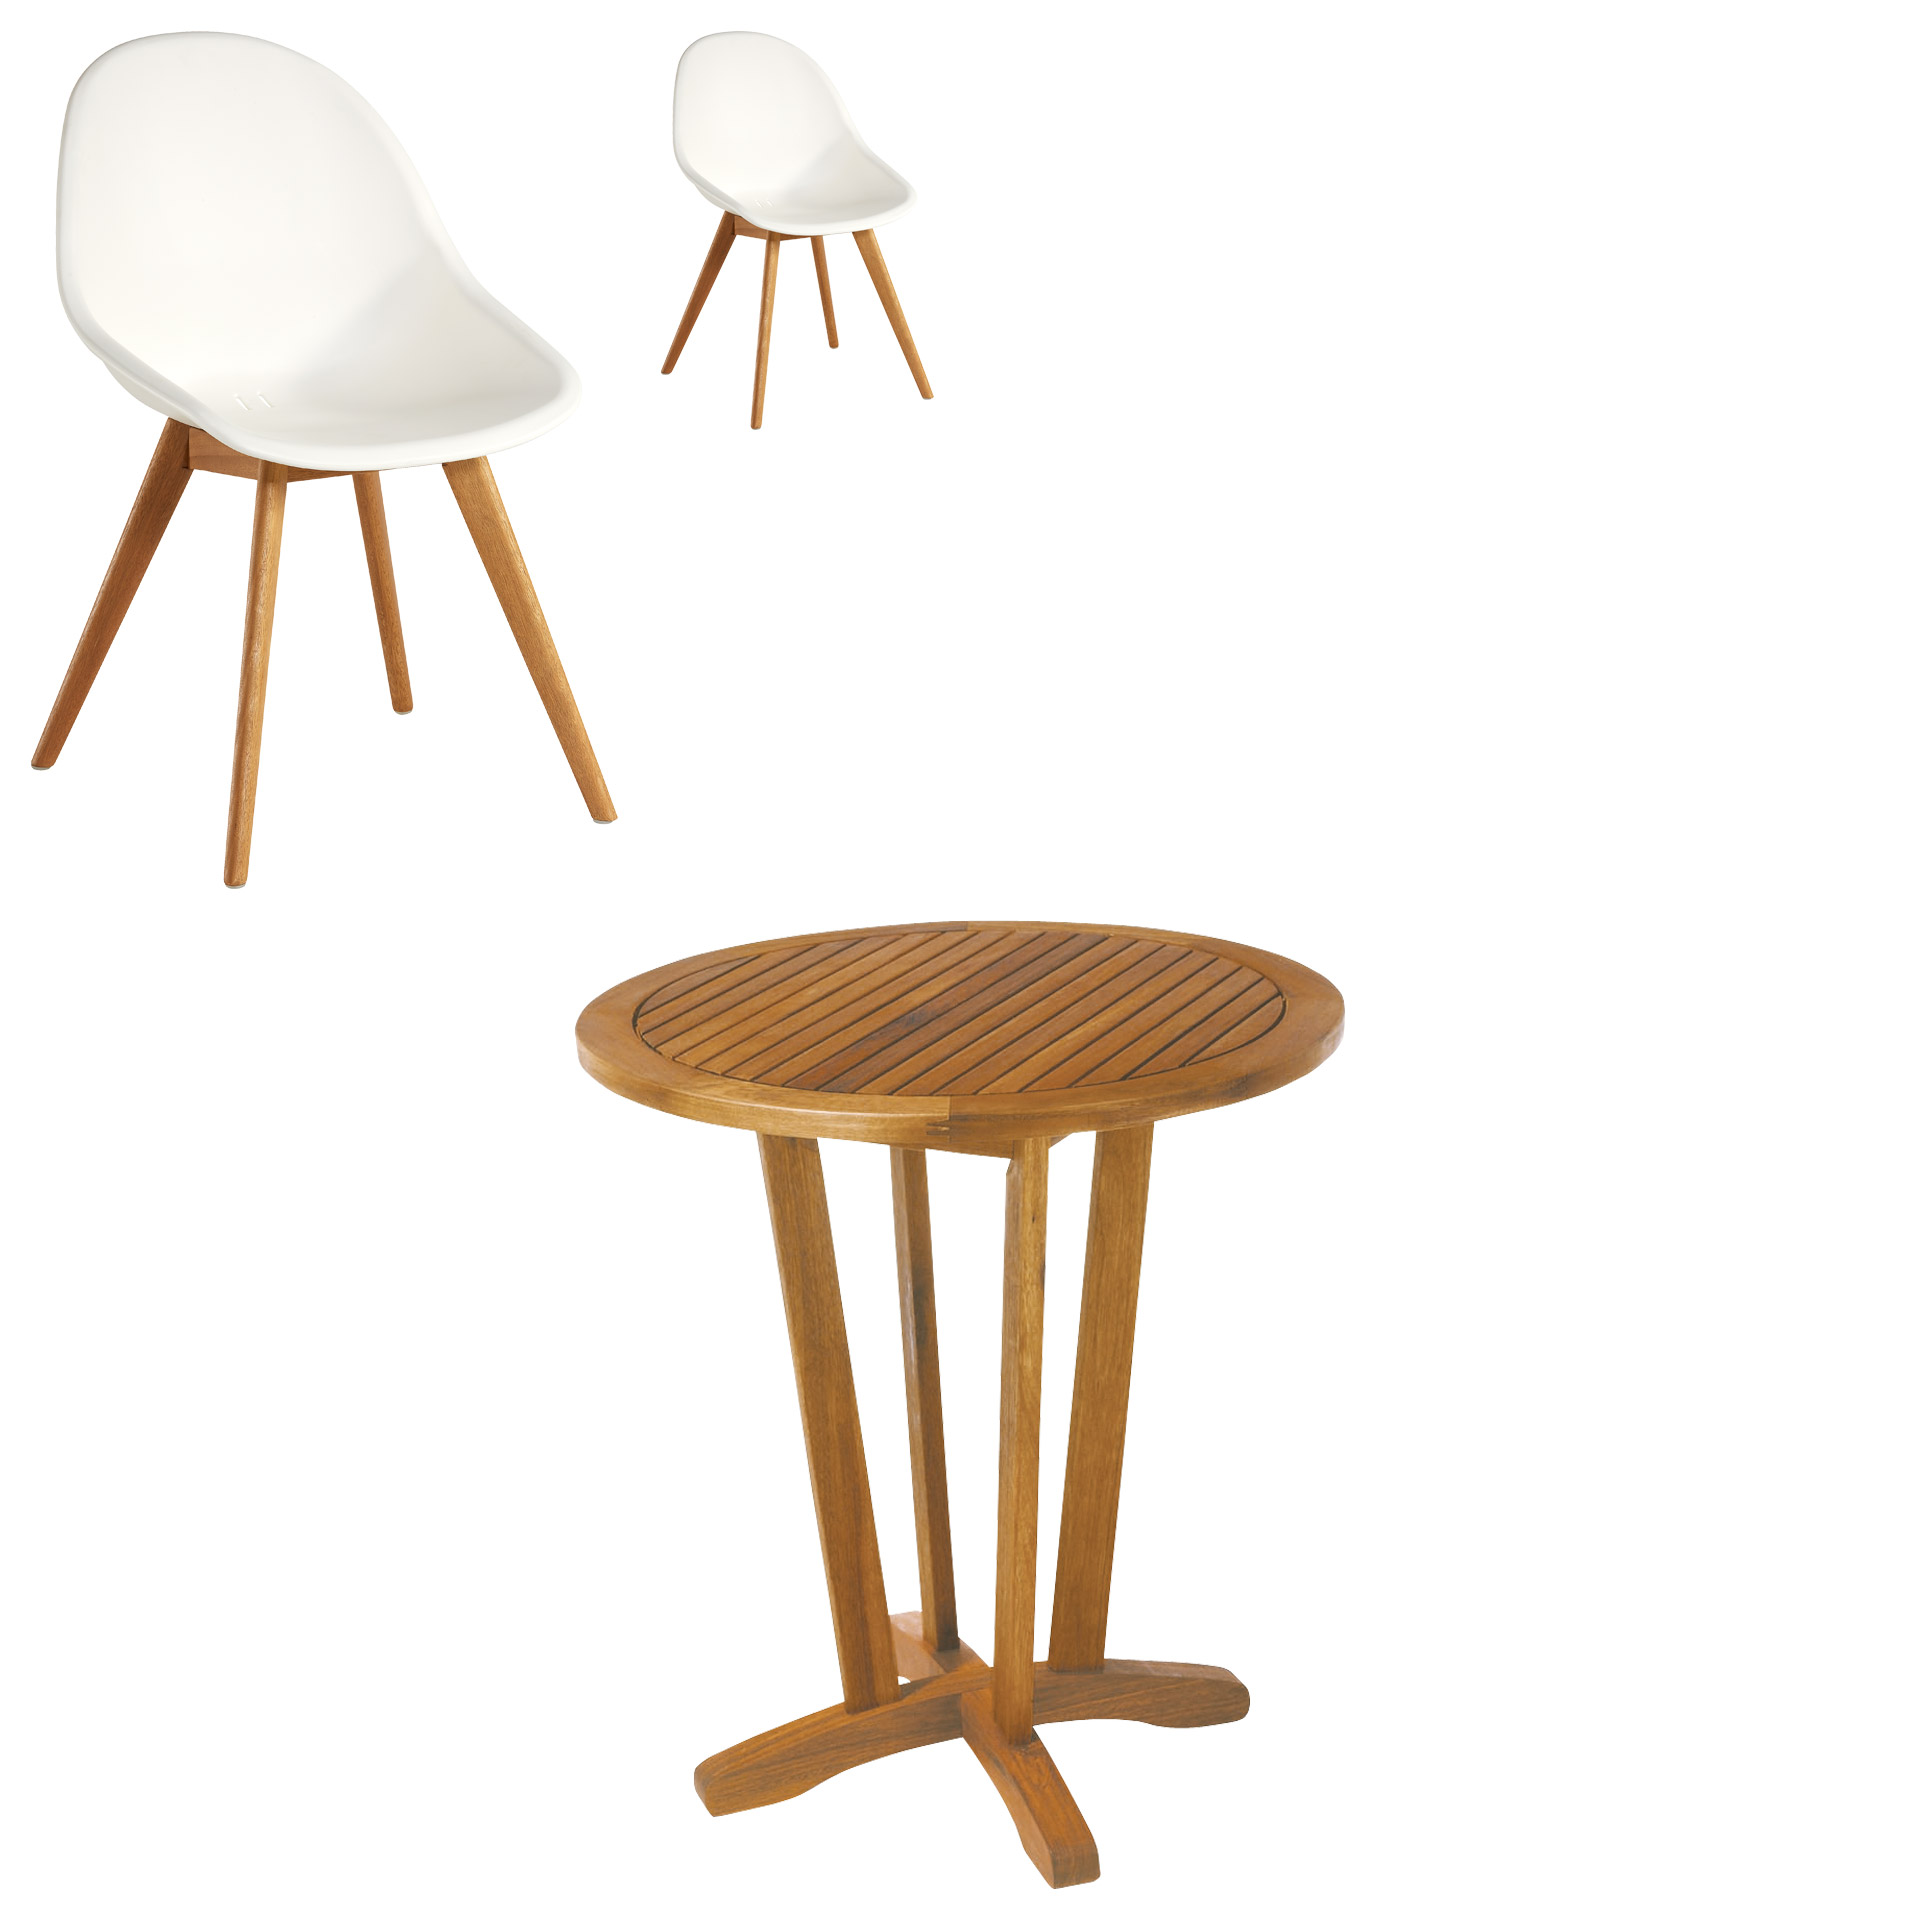 gartenm bel set safari palmas 1 tisch 2 st hle wei gro e auswahl top angebote. Black Bedroom Furniture Sets. Home Design Ideas